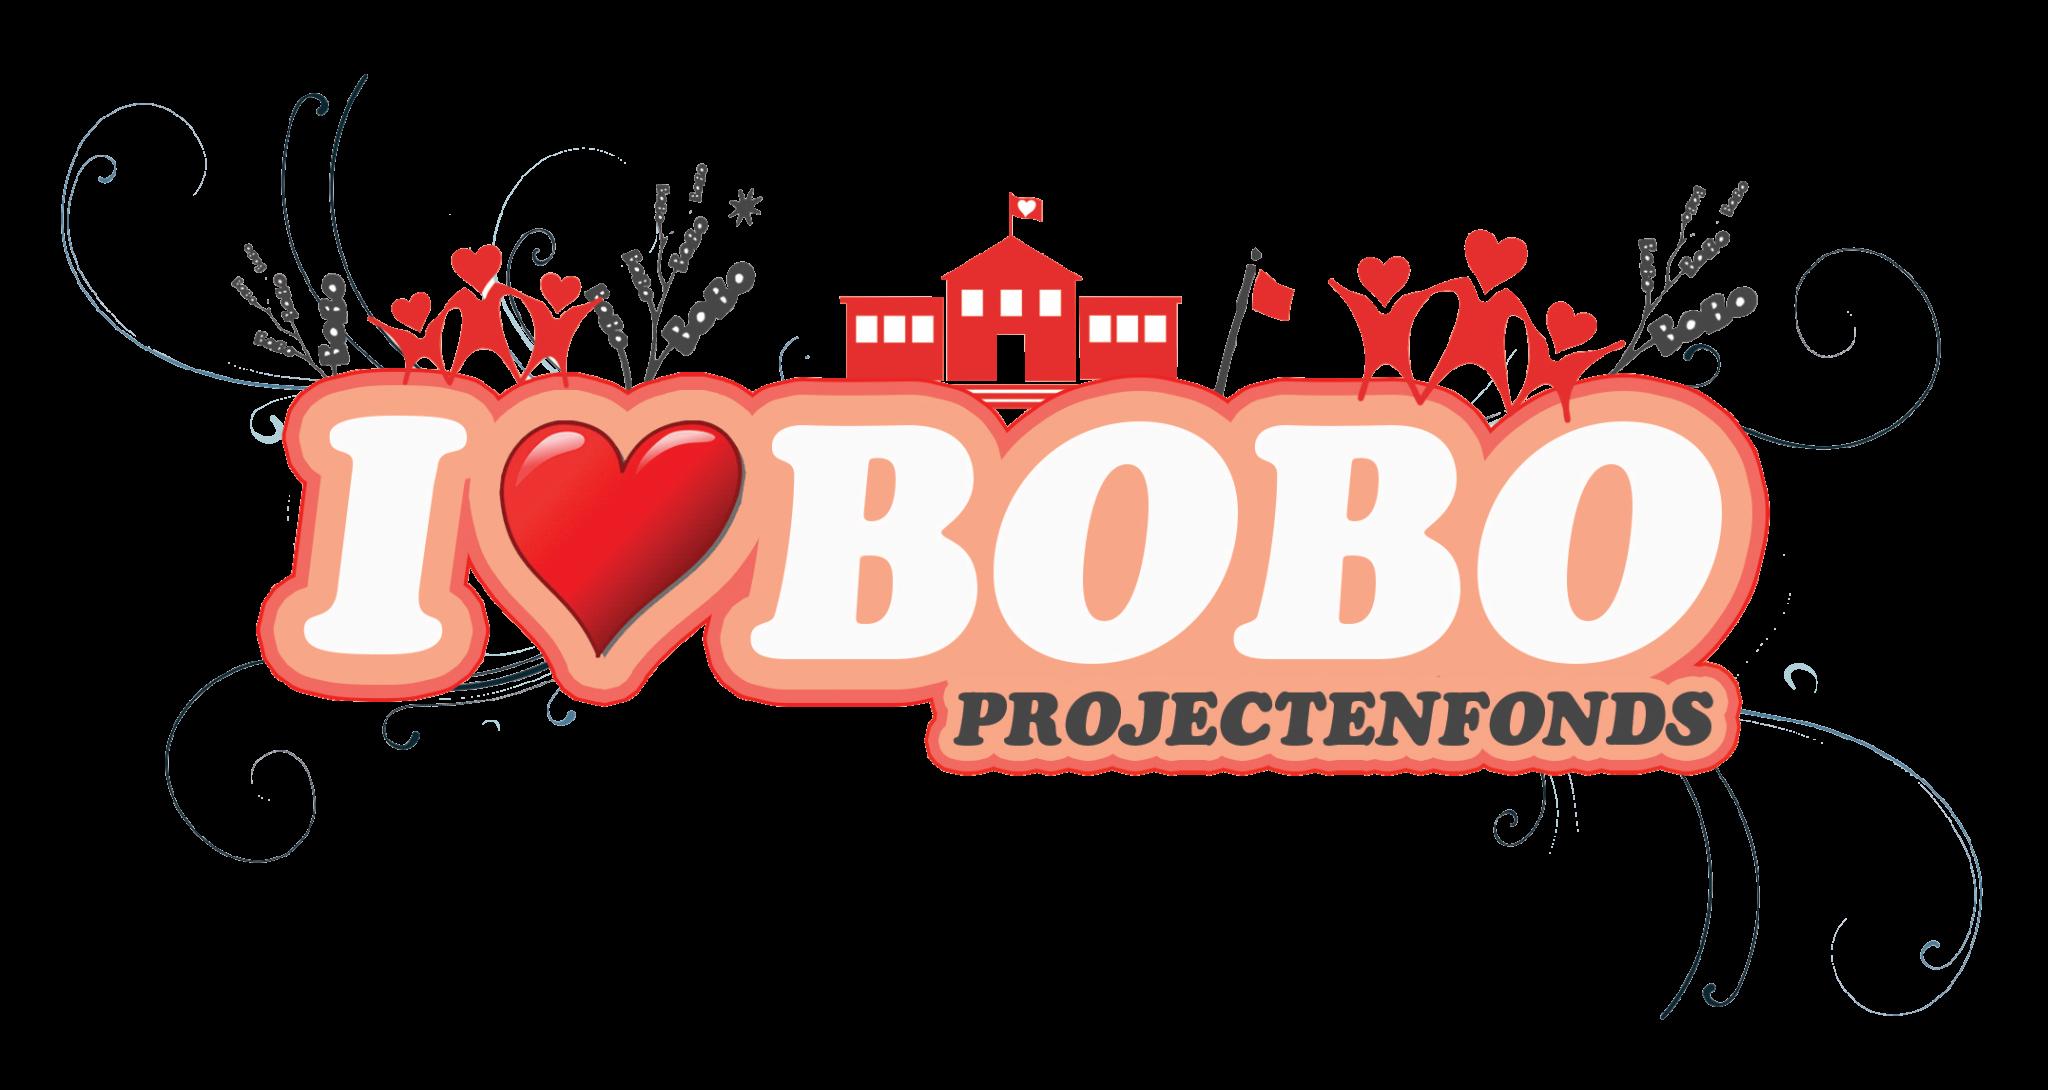 LogoBOBO_PF_01